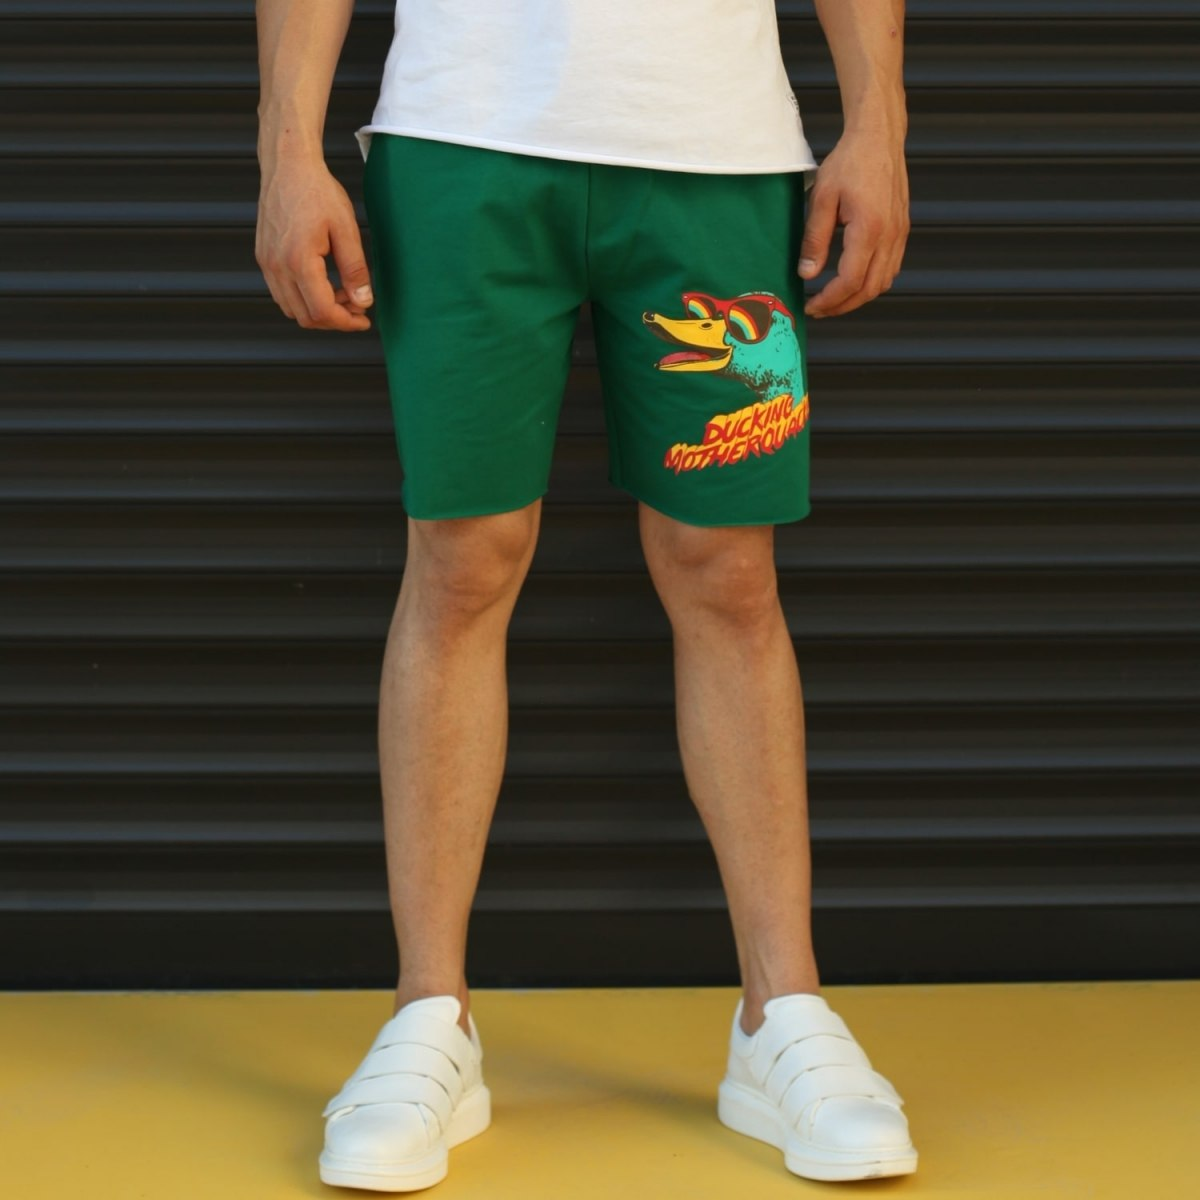 Men's Ducking Motherquackers Fleece Sport Shorts Green Mv Premium Brand - 1